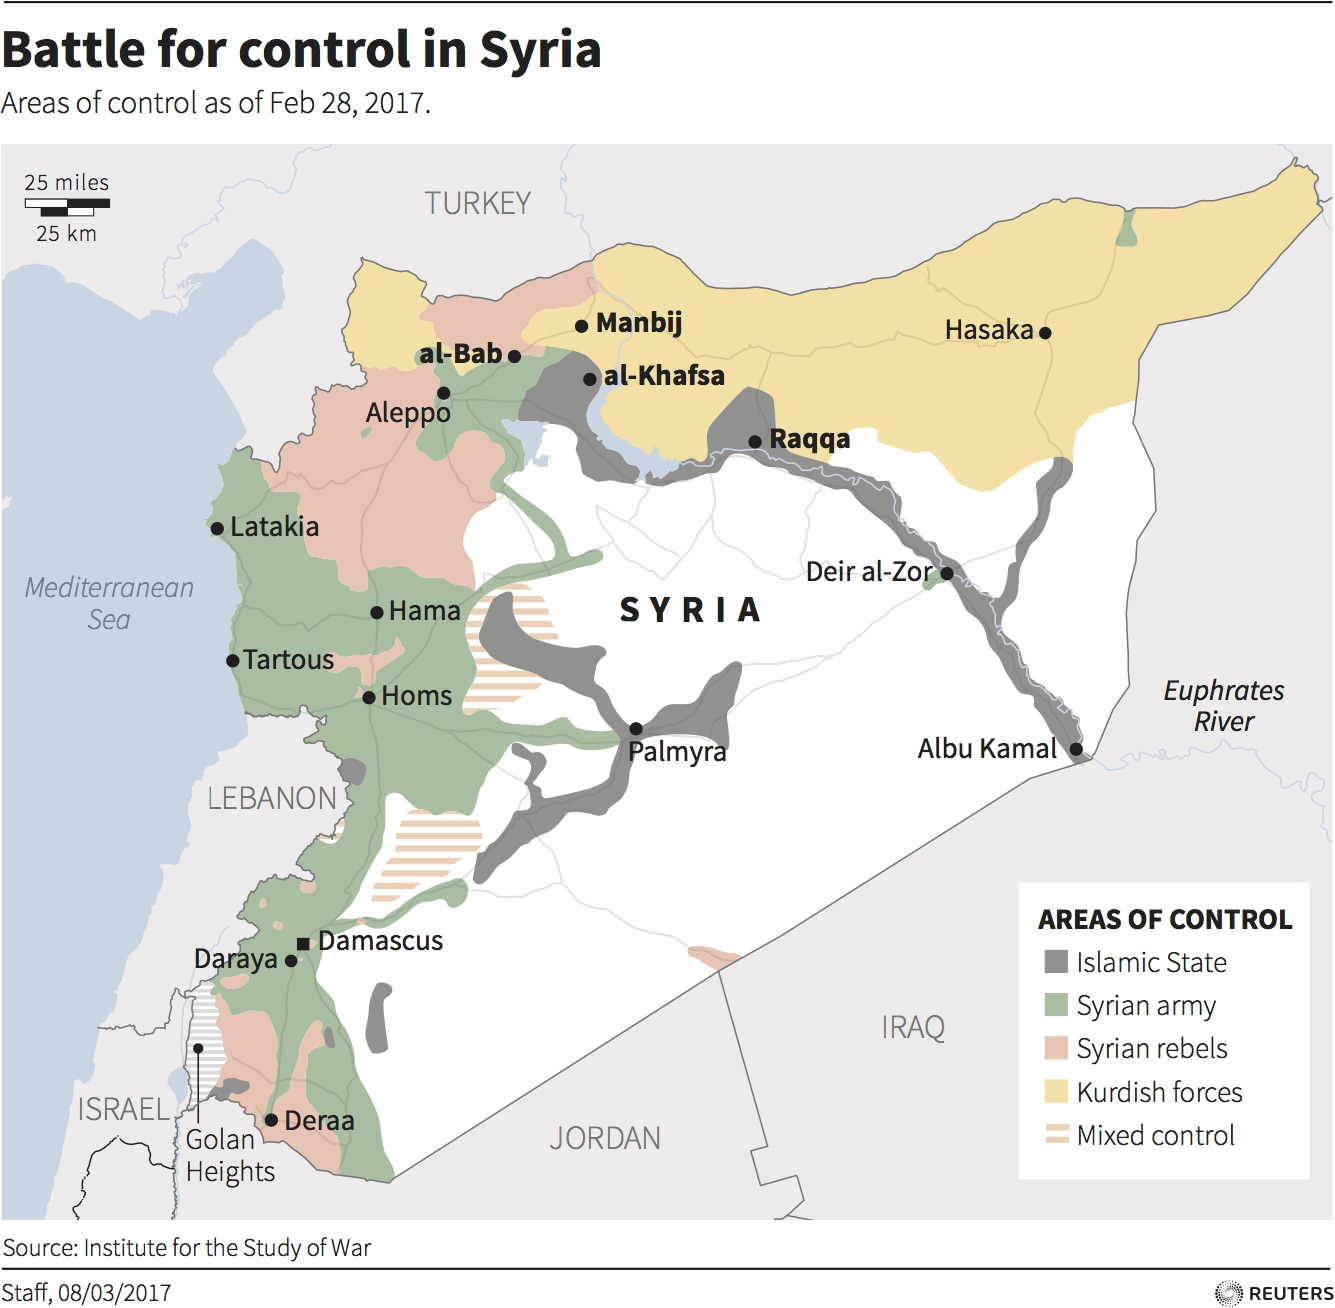 A map showing areas of control in Syria, divided among the ... Map Damascus Syria on pakistan map, tunis tunisia map, damascus oregon map, asma al-assad, kabul afghanistan map, amman jordan map, baghdad map, world map, jerusalem map, beirut lebanon map, bahrain map, golan heights map, ancient damascus map, istanbul map, damascus steel, middle east map, rome italy map, arabian sea map, bashar al-assad, algiers algeria map, mid east map, damascus citadel, tripoli lebanon map, tel aviv,